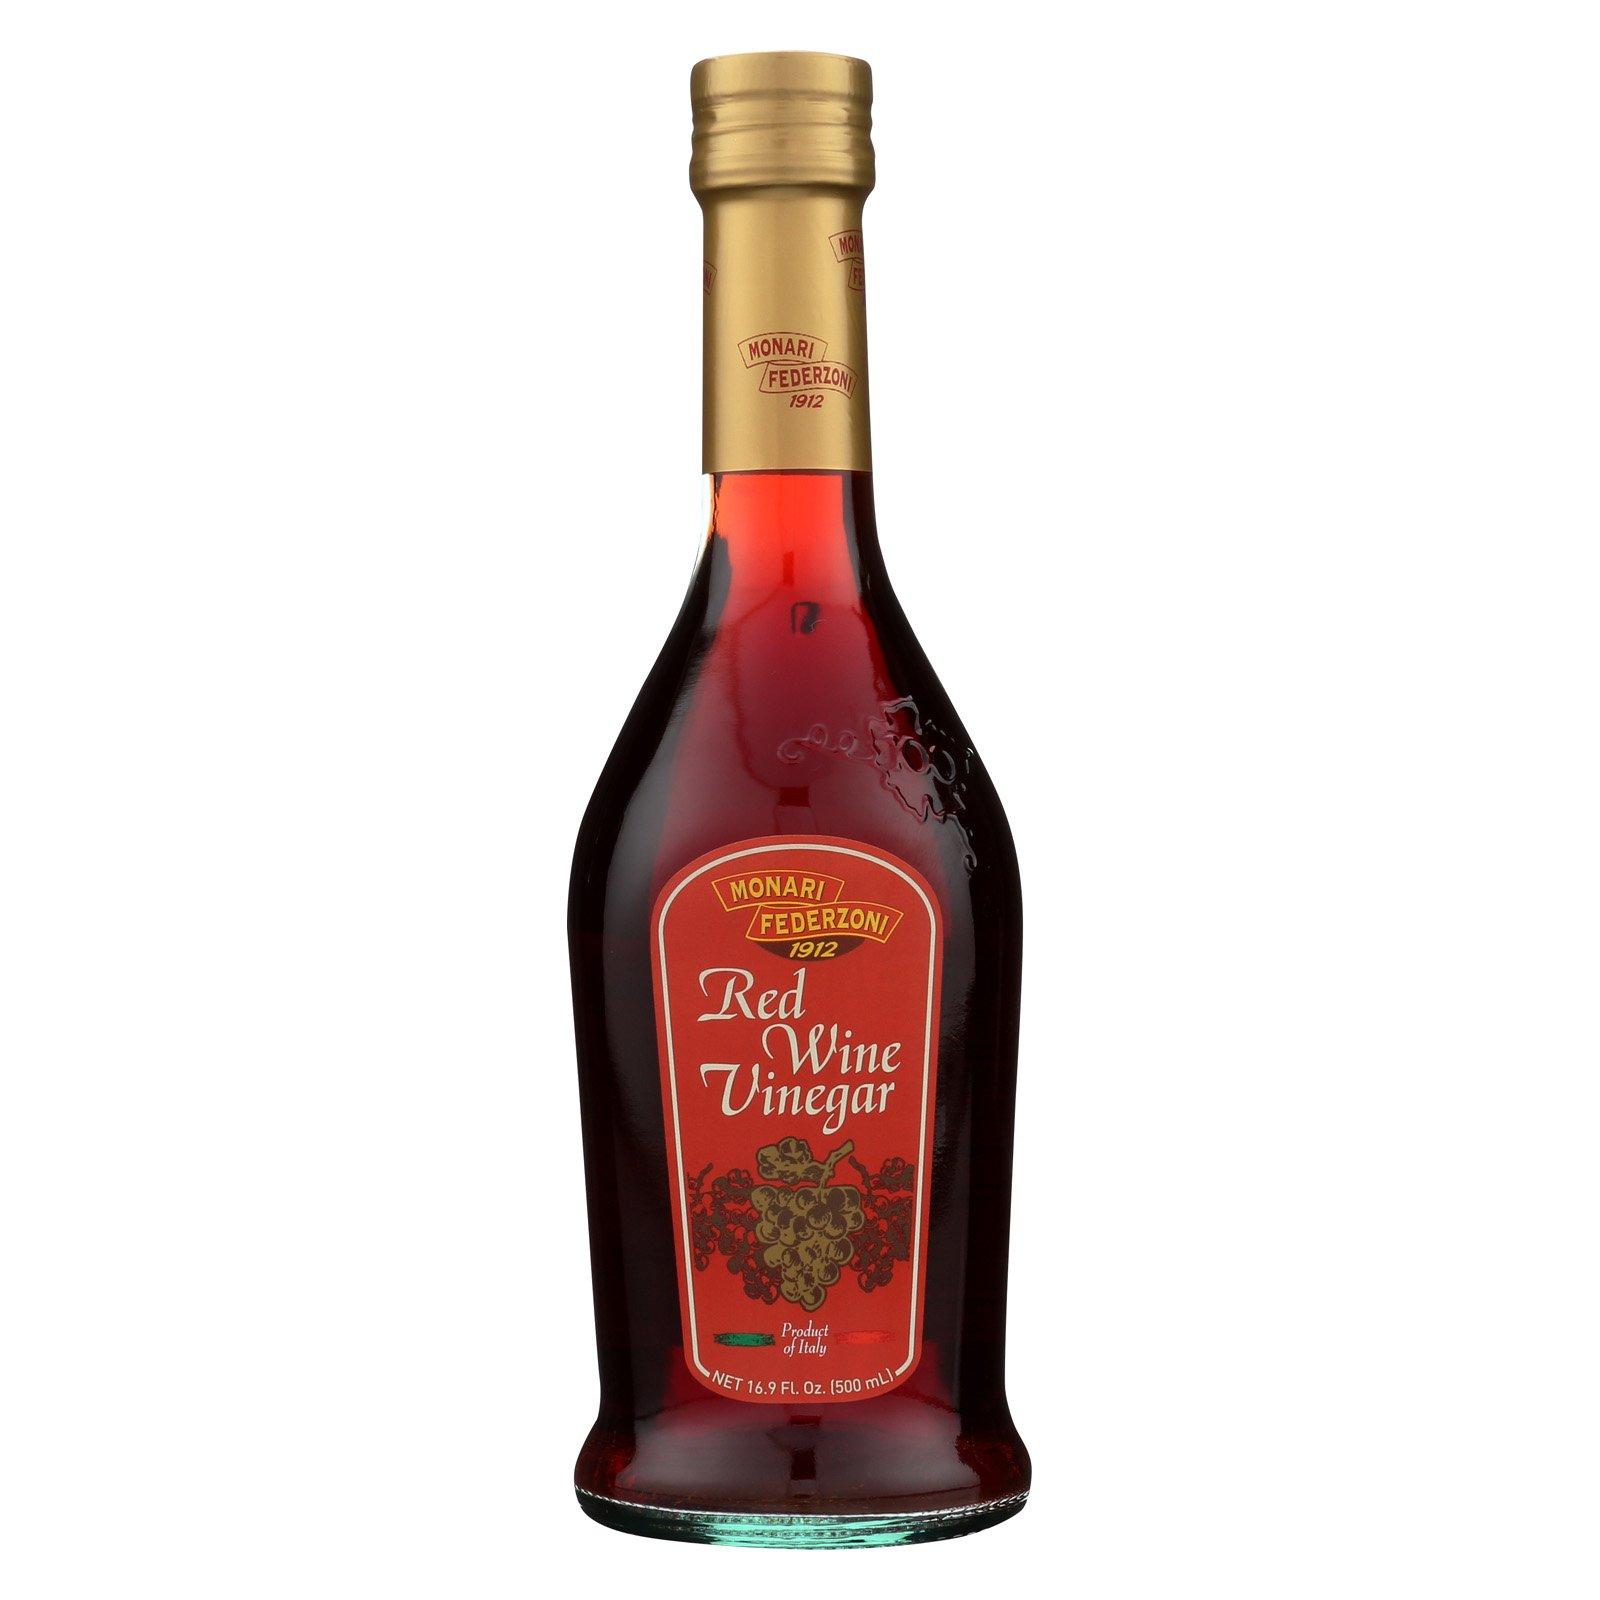 Monari Federzoni Red Wine Vinegar - Case of 6-16.9 Fl oz.